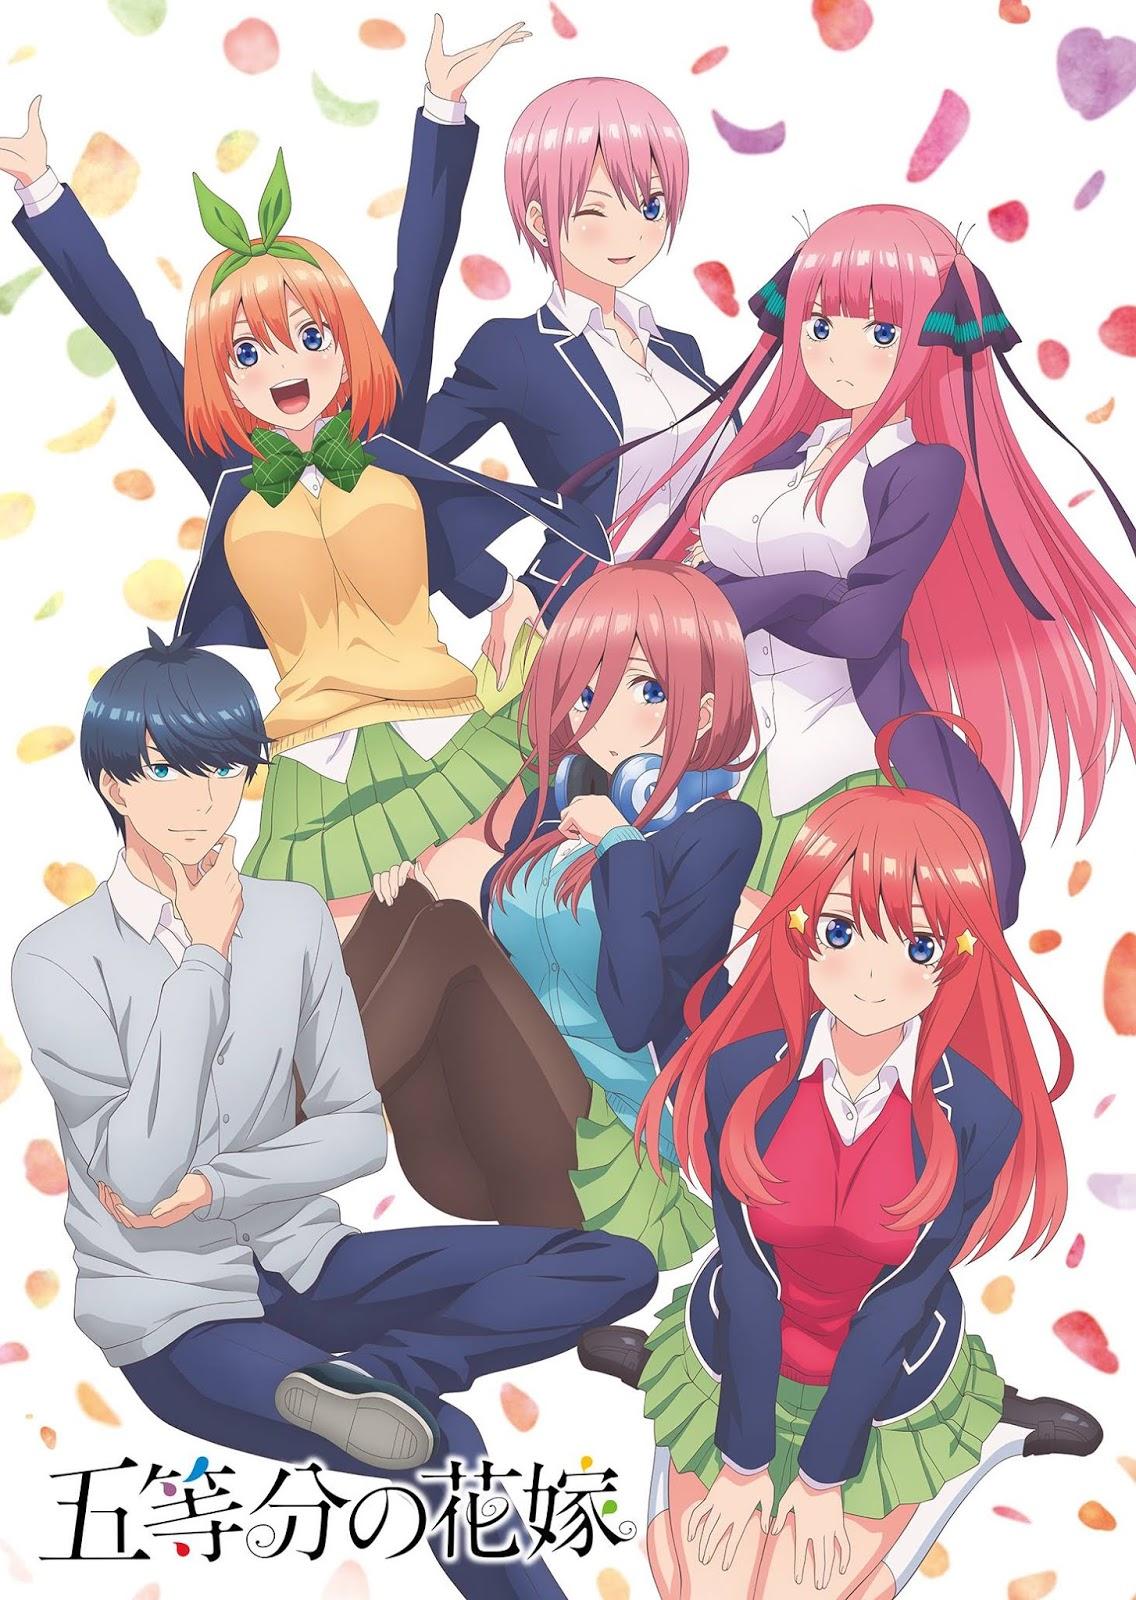 Anime Review] Gotoubun no Hanayome - Anime Harem Ladang Waifu yang ...